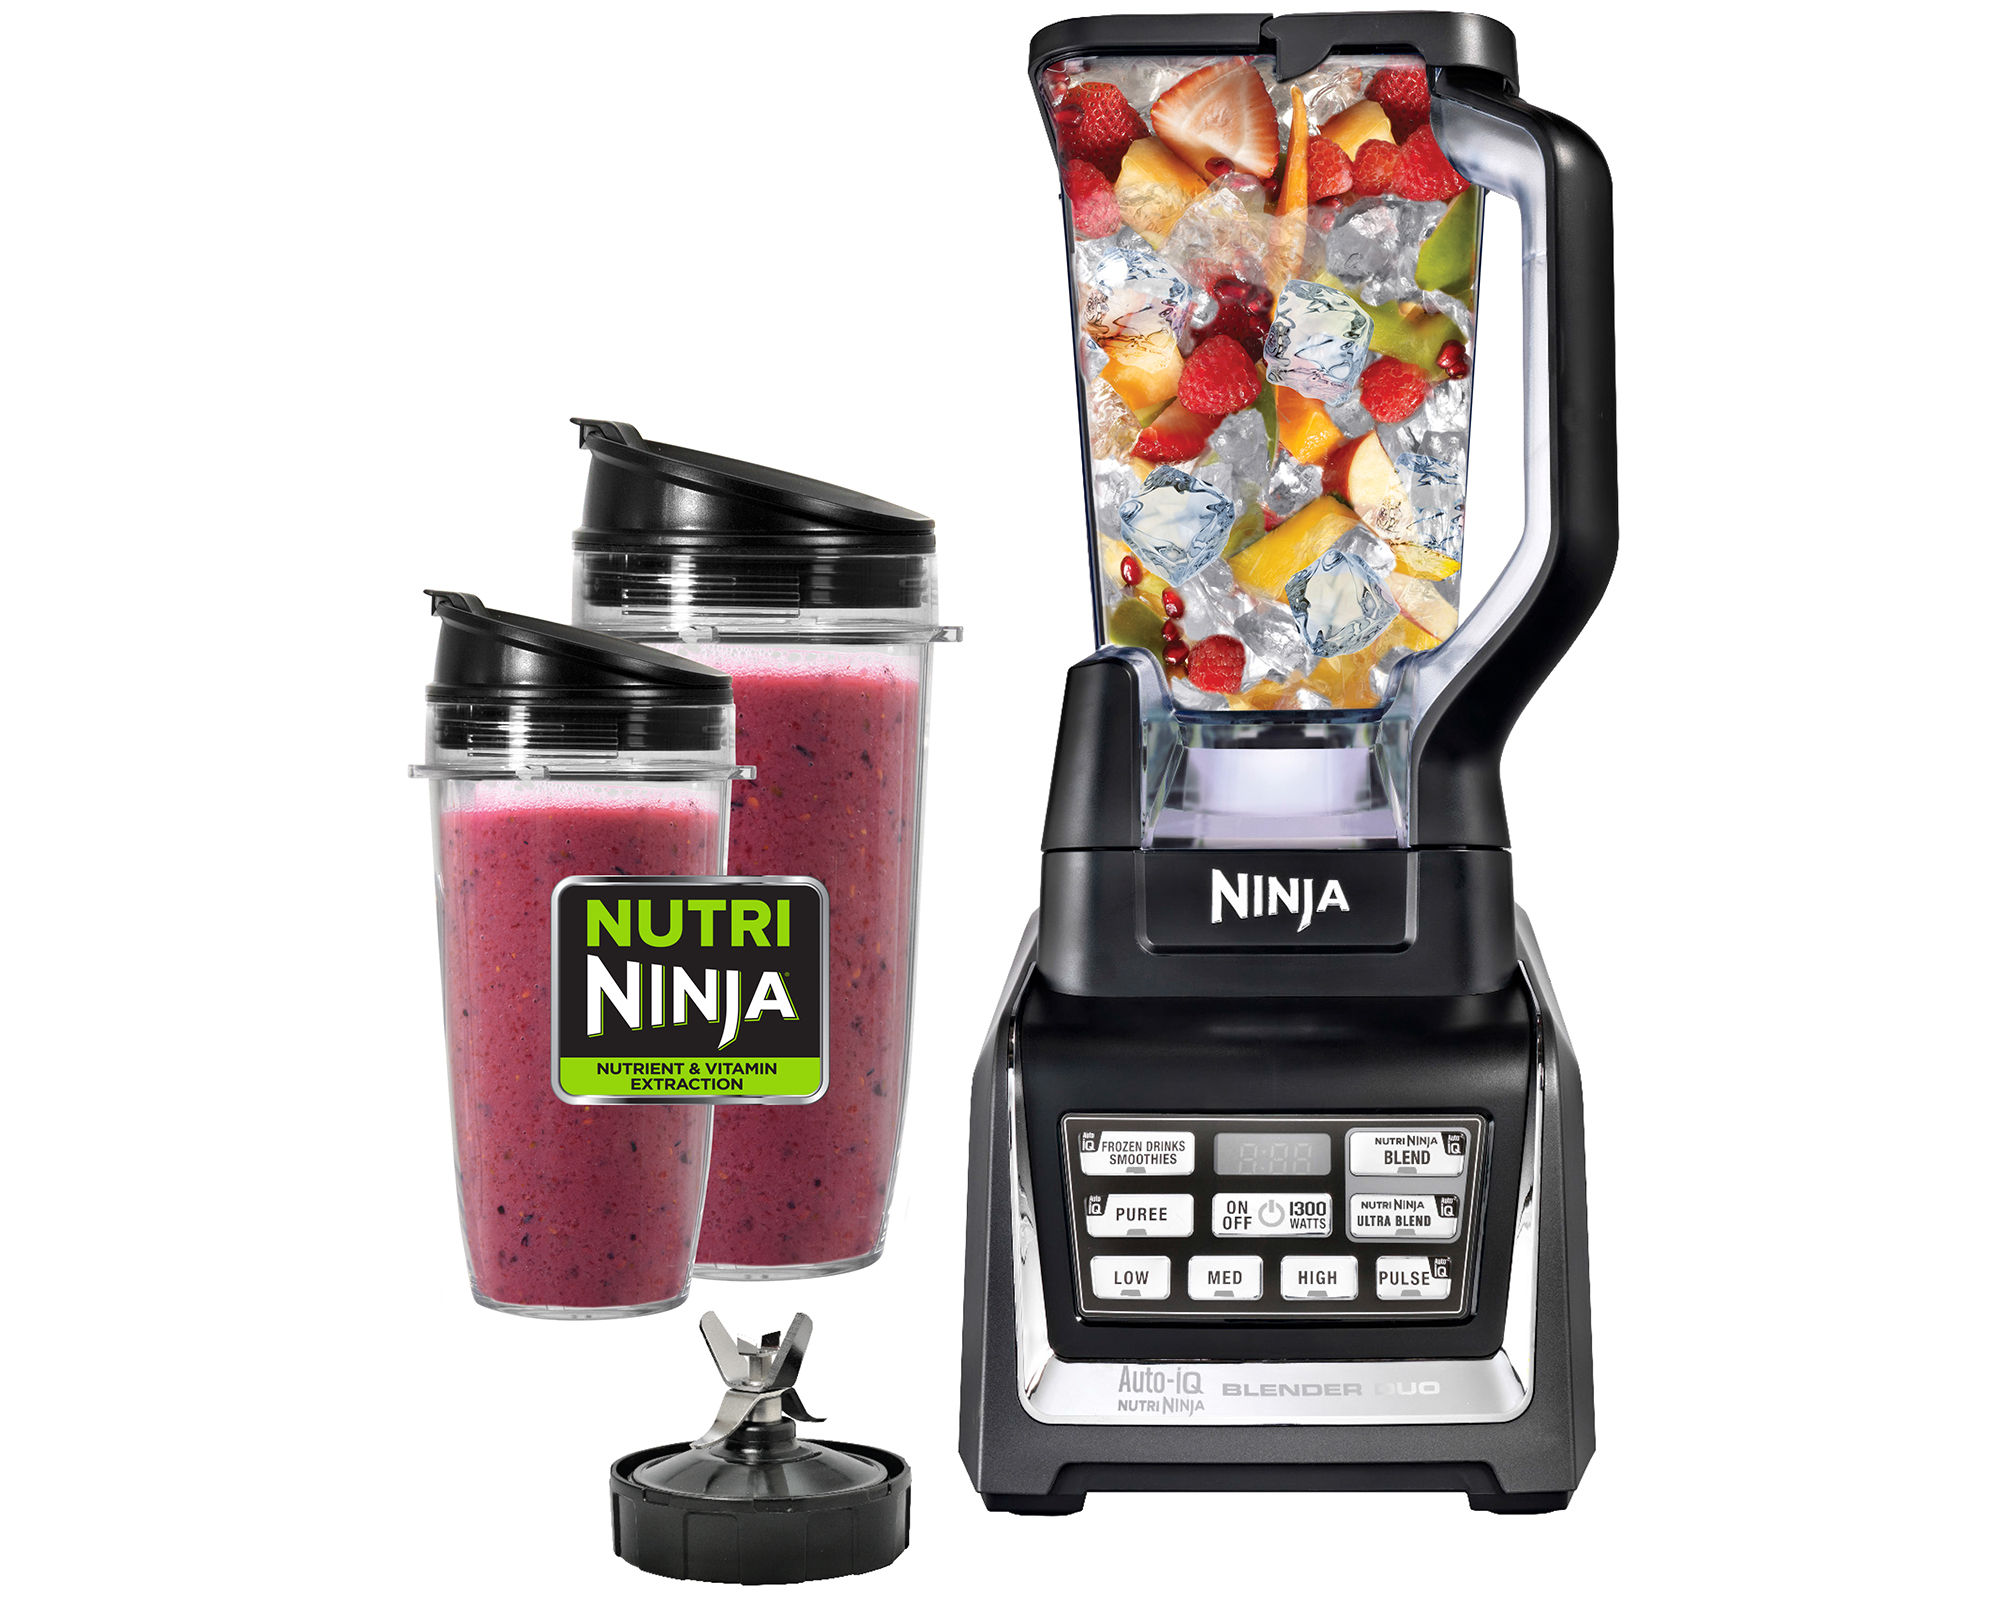 Nutri Ninja - Ninja Blender Duo\